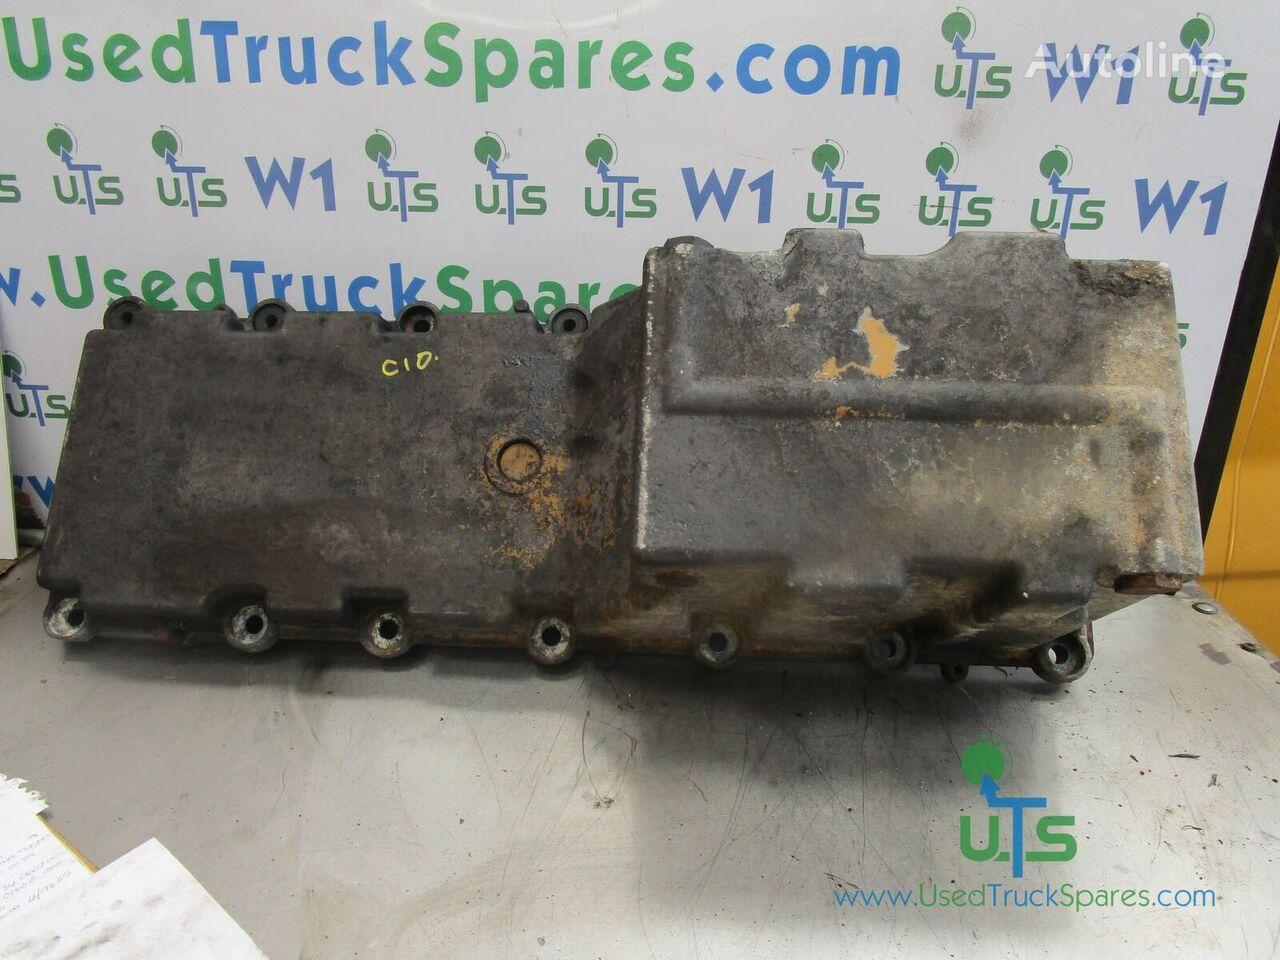 CATERPILLAR Foden Truck Spares crankcase for truck